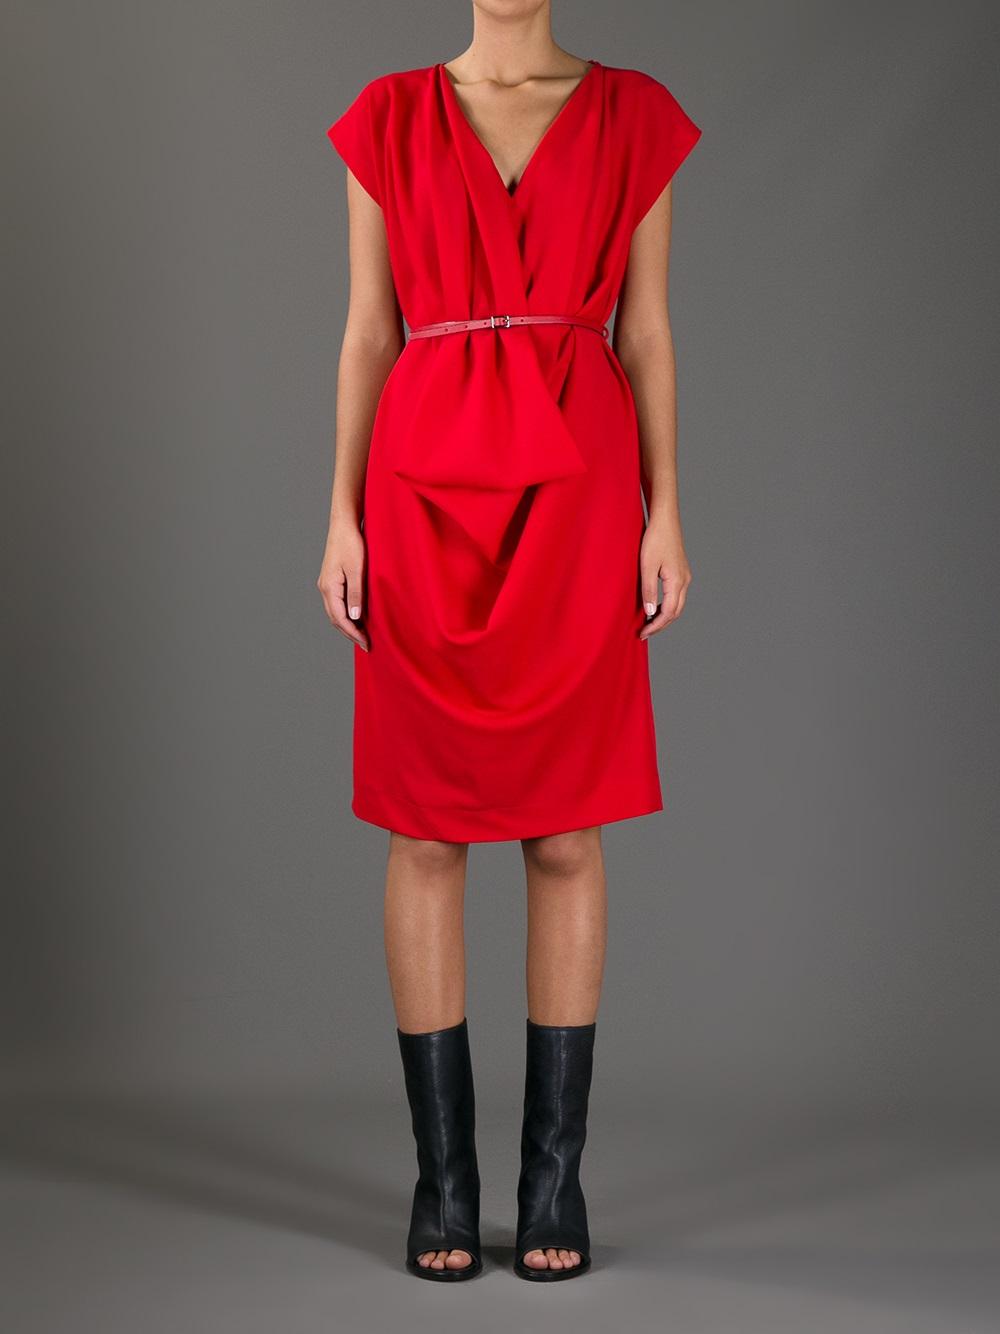 DRESSES - Long dresses Tim Van Steenbergen TnhR9k33Dx